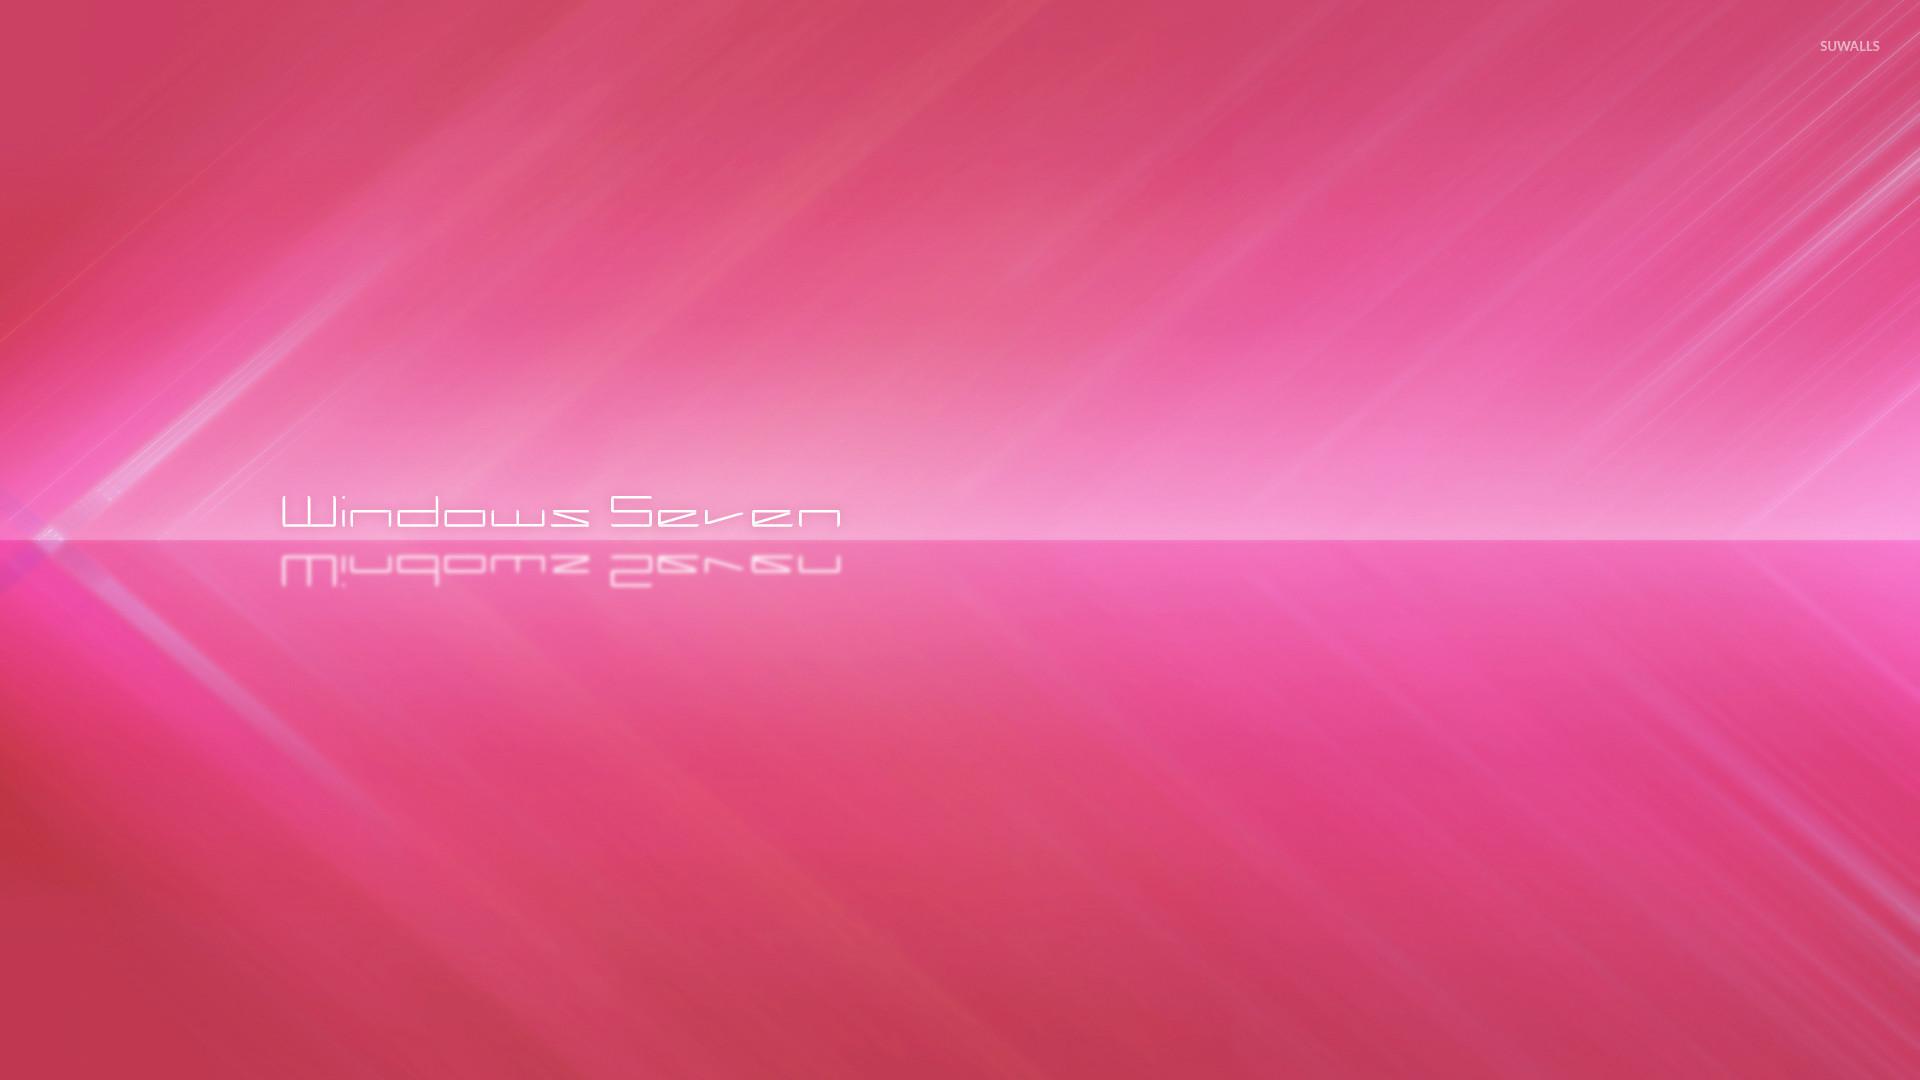 White Windows Seven between pink stripes wallpaper jpg